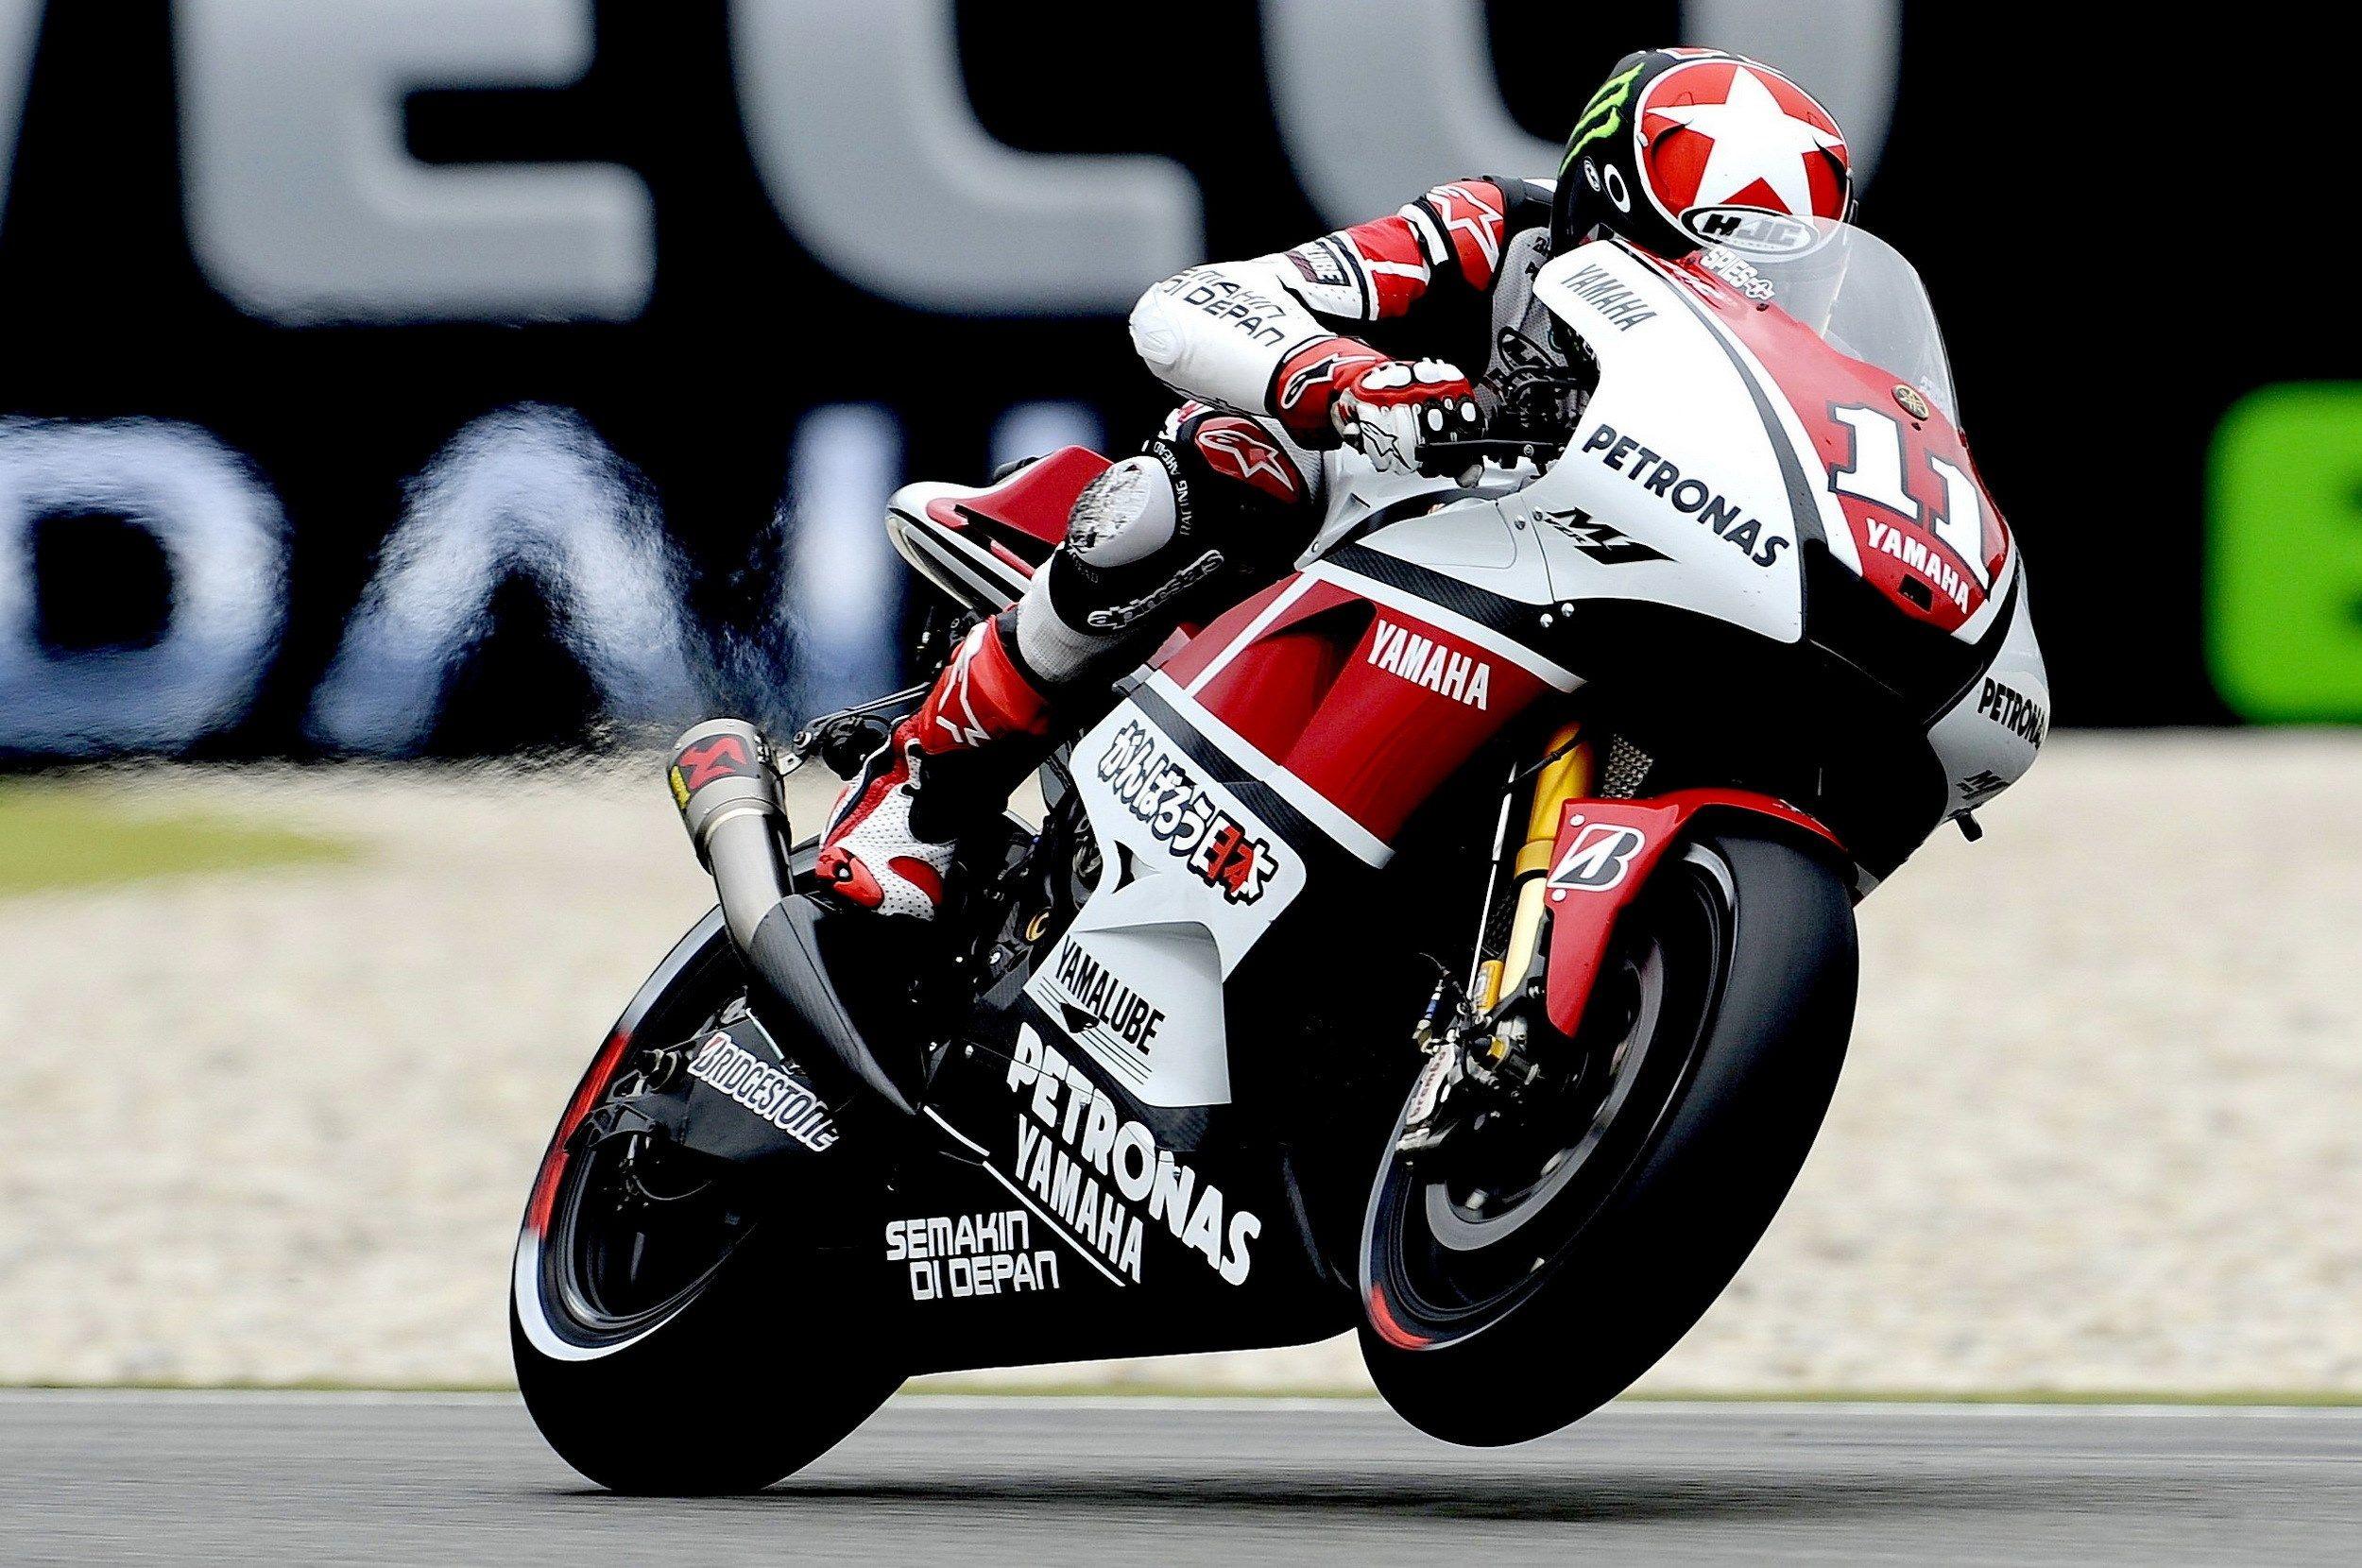 Wallpaper Desktop Motorcycle Racing With Images Yamaha Sport